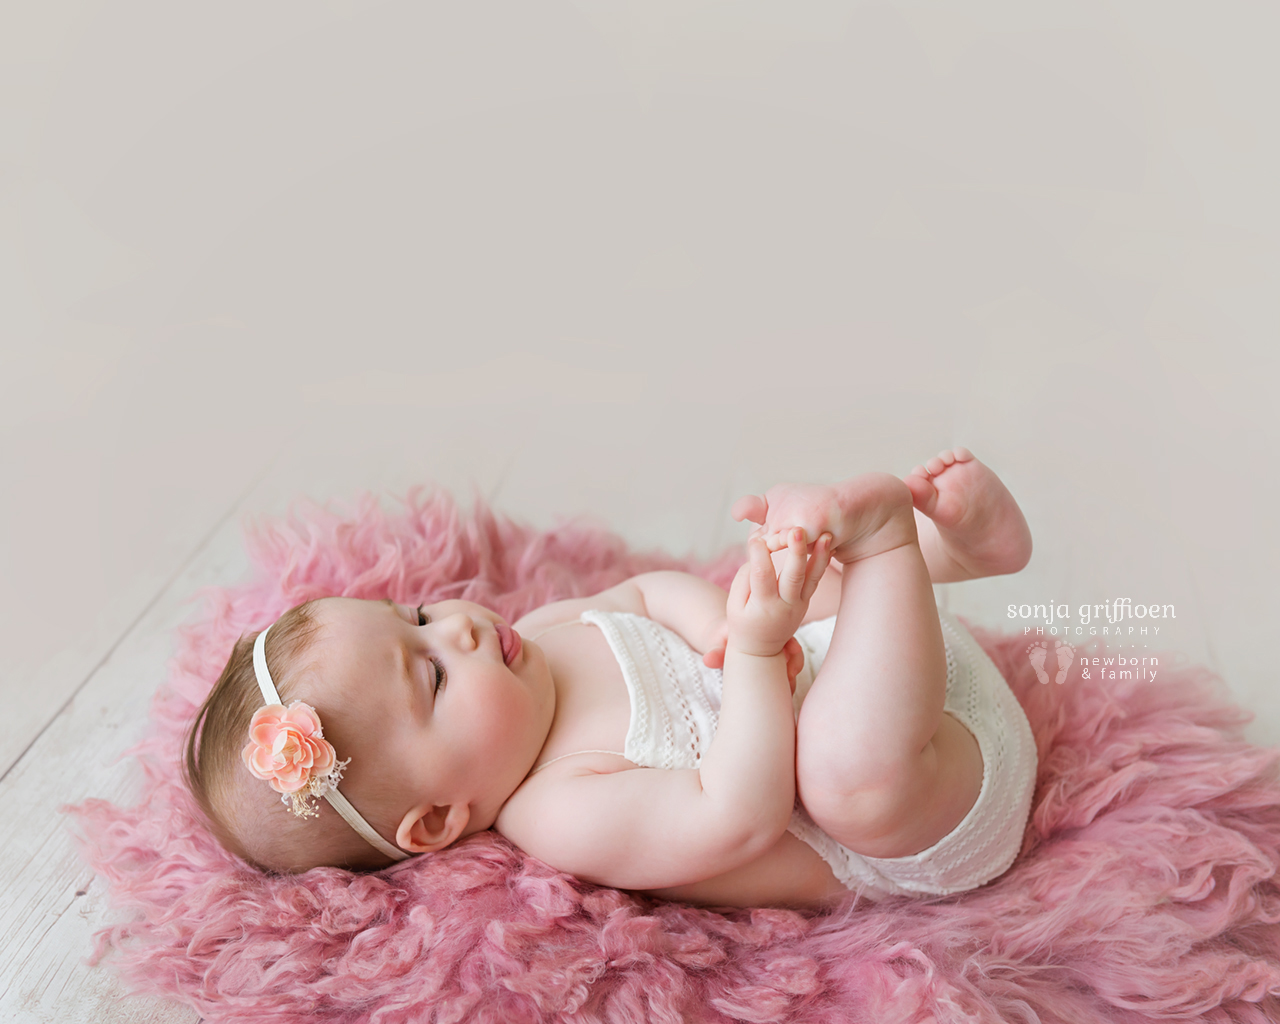 Everlyn-Milestone-Brisbane-Baby-Photography-Sonja-Griffioen-16.jpg